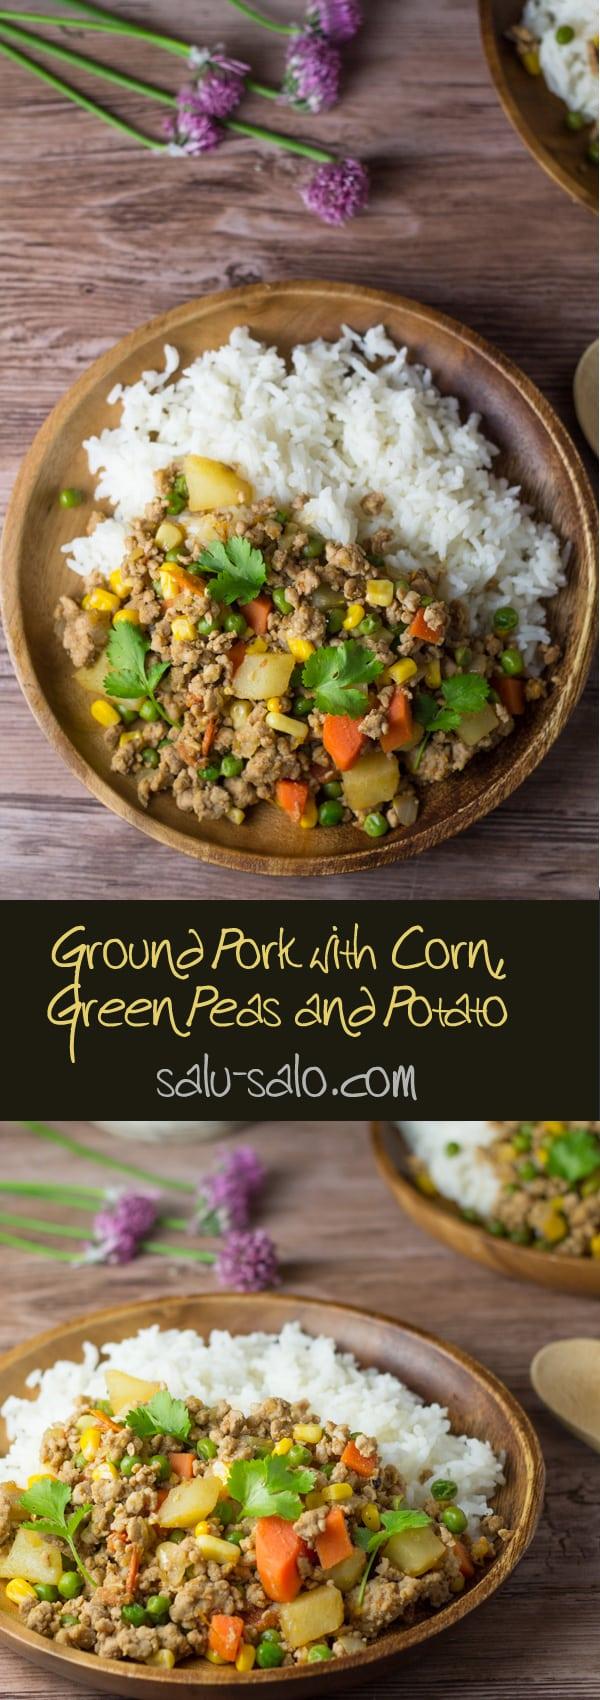 Ground Pork with Corn, Green Peas and Potato